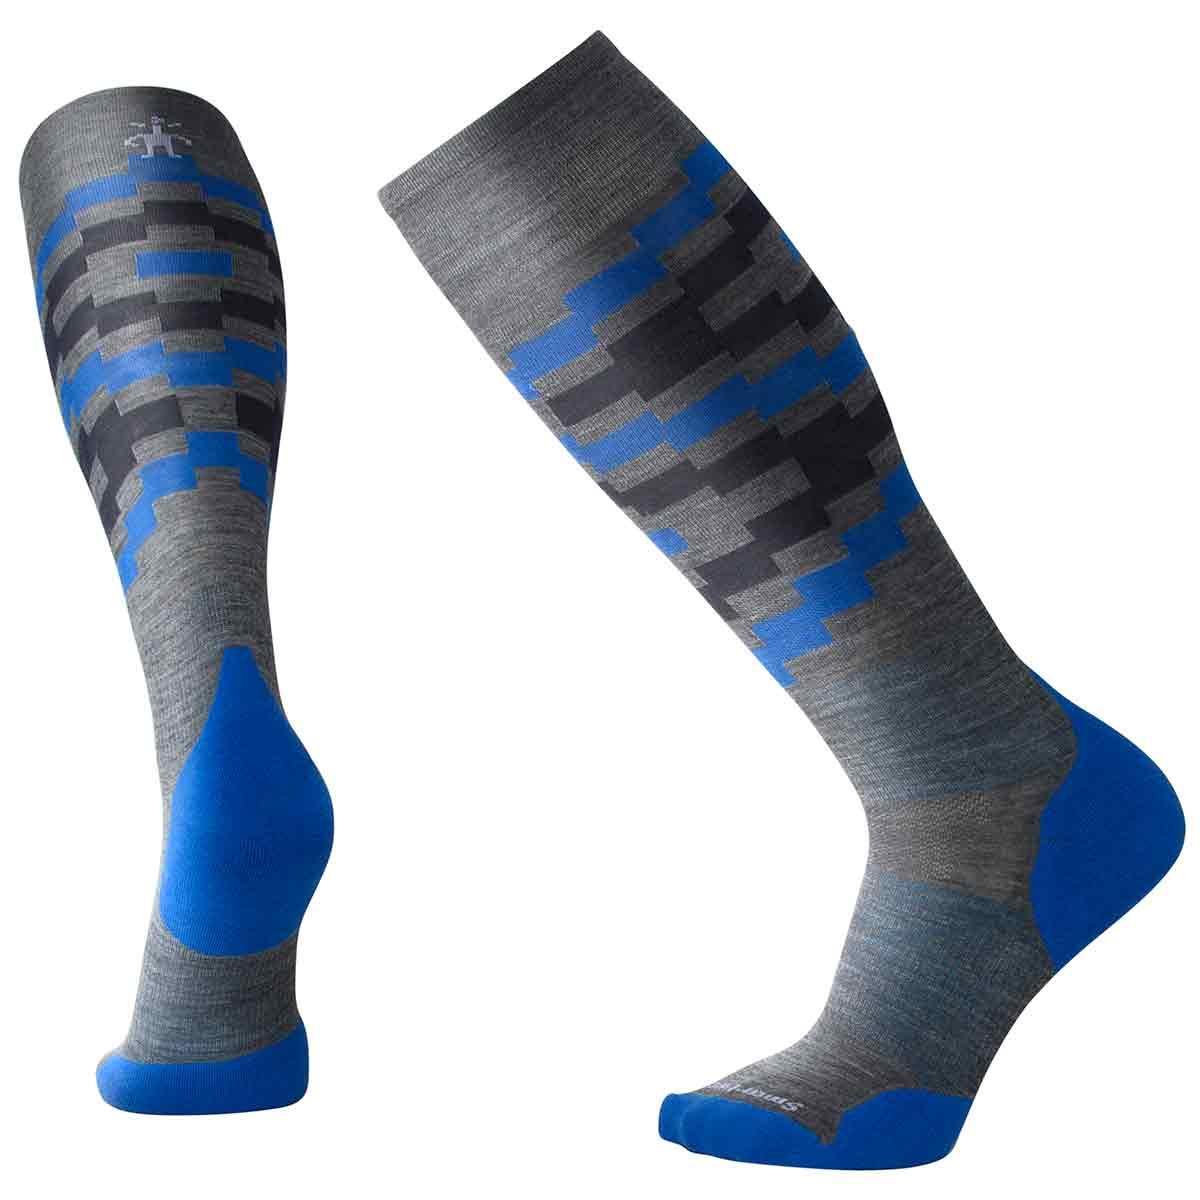 Smartwool Men's Phd Ski Light Elite Pattern Socks - Black, L